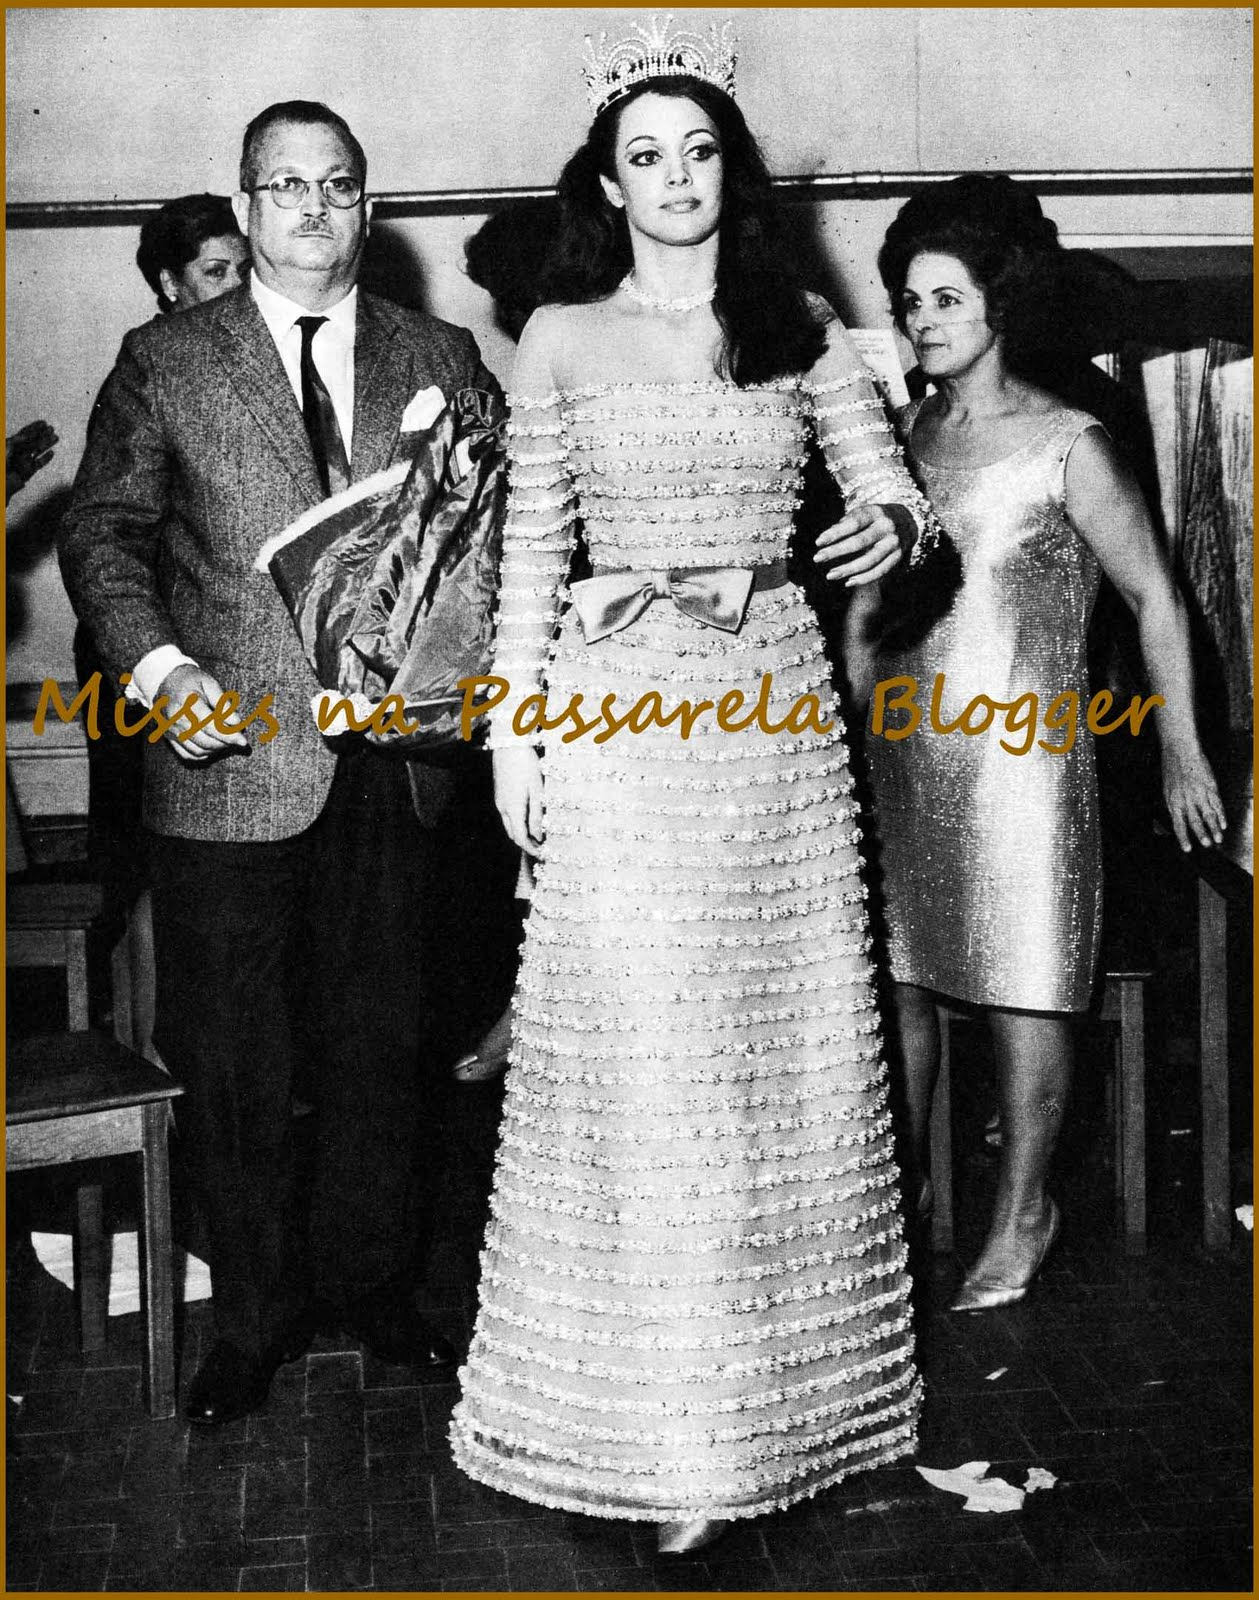 ☽ ✮ ✯ ✰ ☆ ☁ Galeria de Martha Vasconcelos, Miss Universe 1968.☽ ✮ ✯ ✰ ☆ ☁ Miss%2BBrasil%2B68